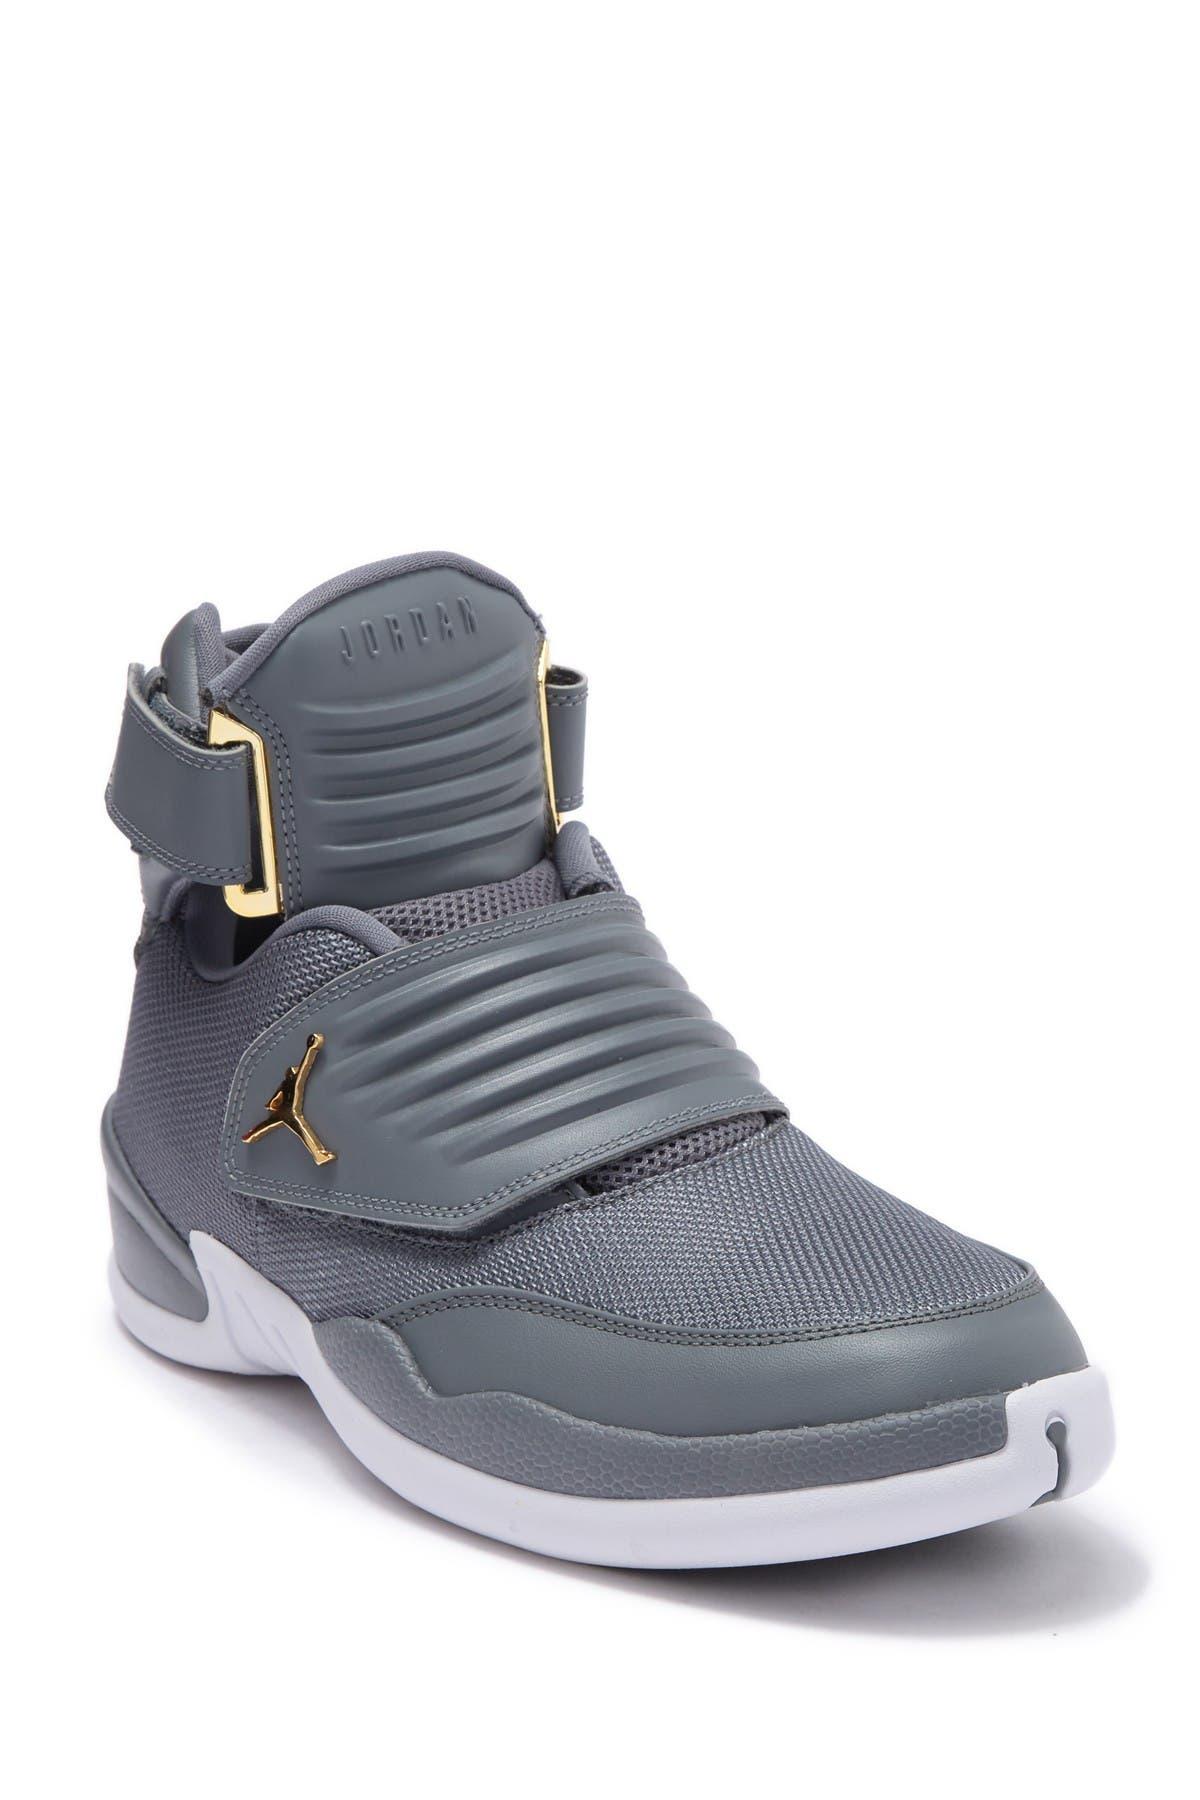 Nike | Jordan Generation High Top